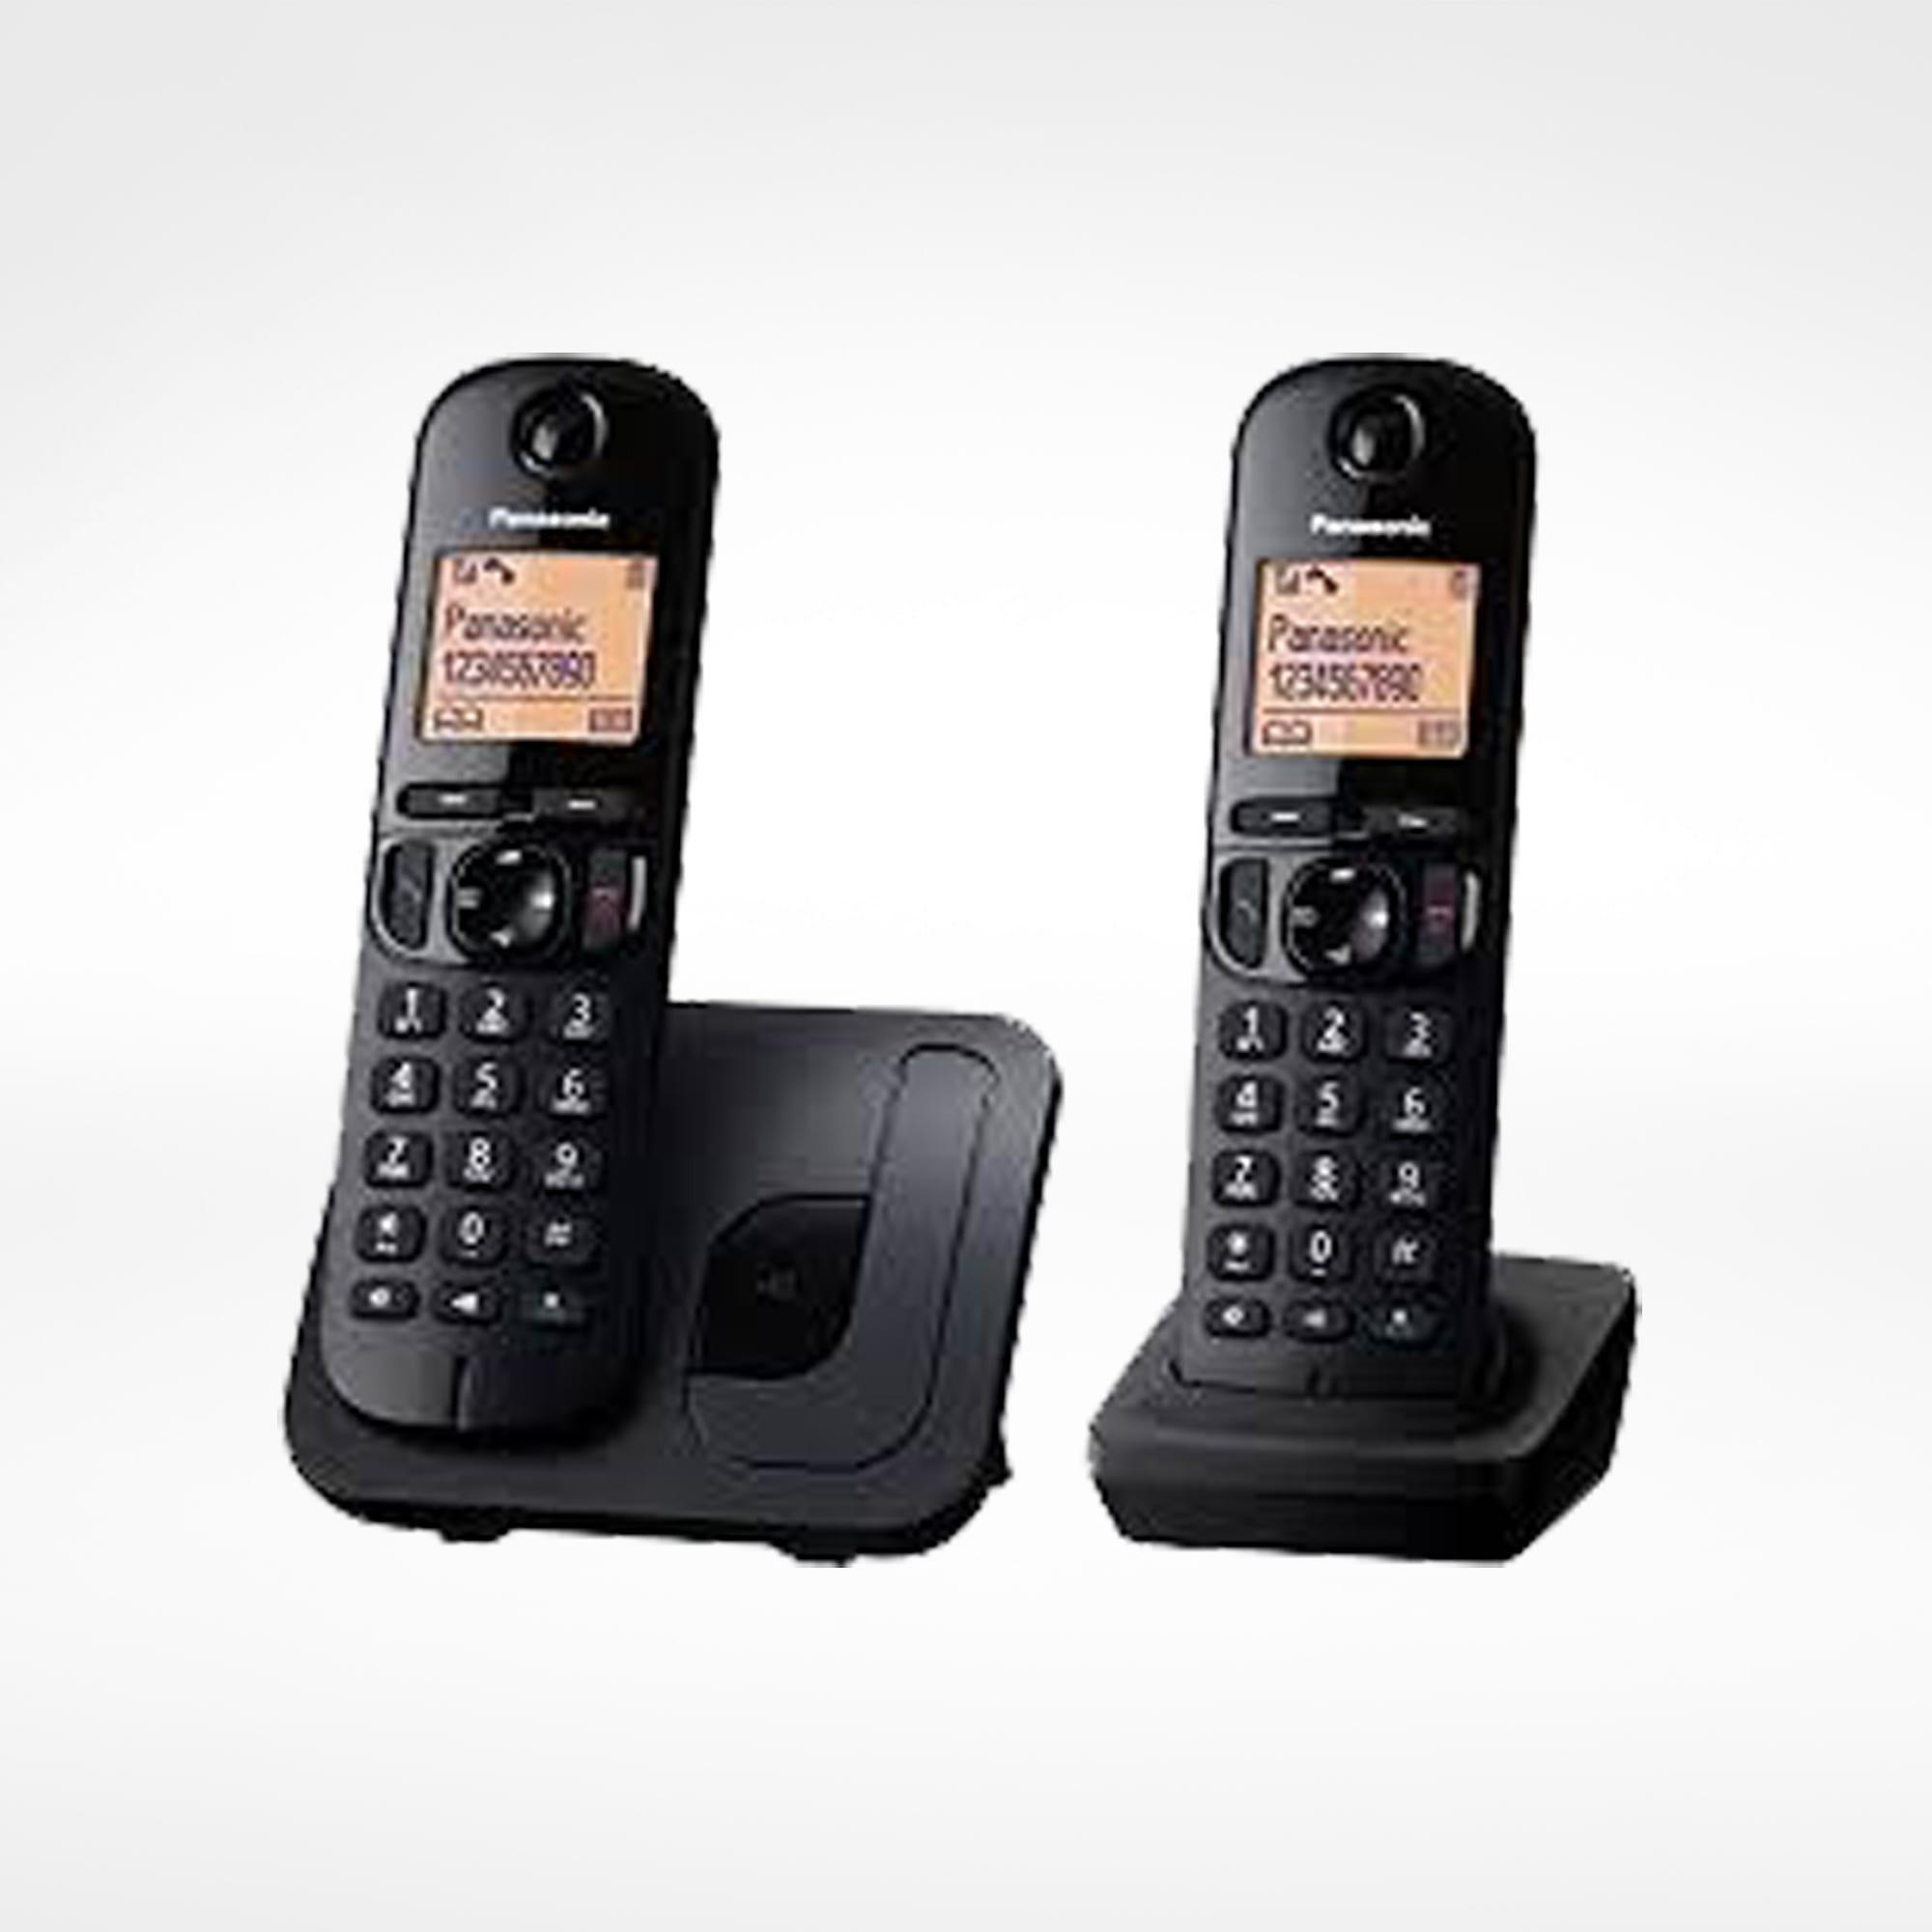 PANASONIC DECT PHONE KX-TGC212FXB